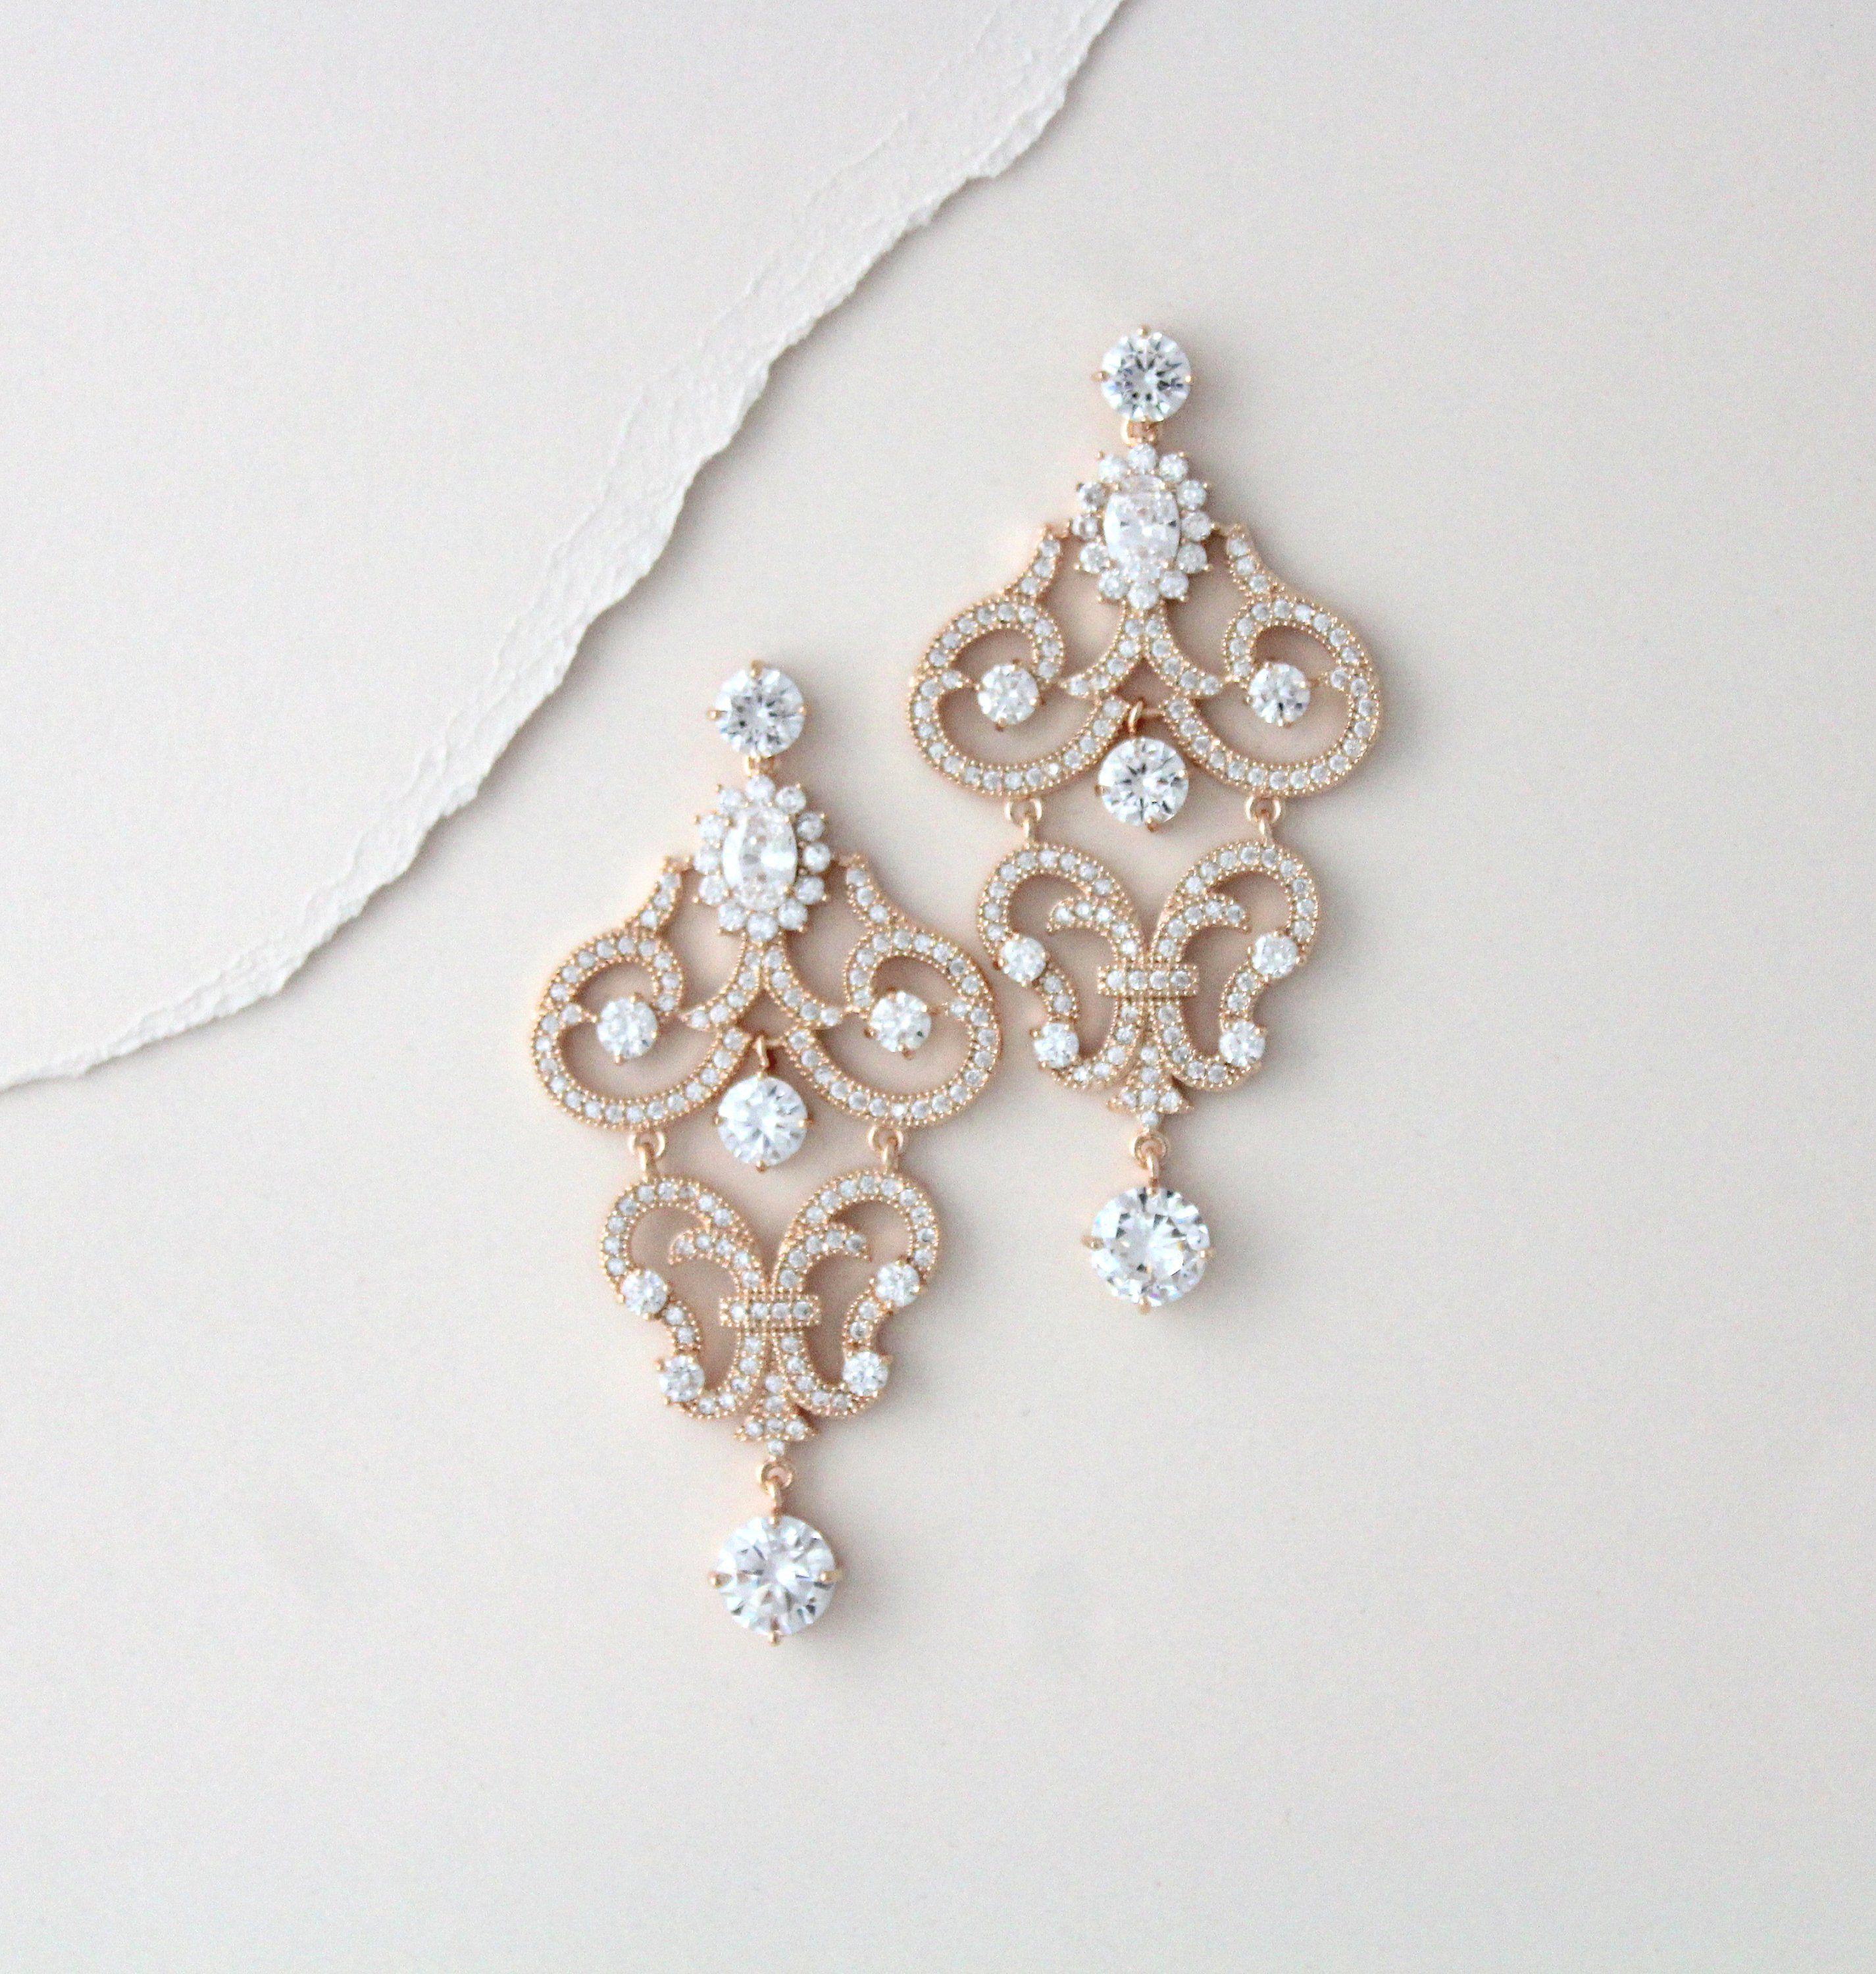 Rose Gold Bridal Earrings Bridal Jewelry Statement Chandelier Etsy Gold Bridal Earrings Rose Gold Bridal Jewelry Set Gold Chandelier Earrings Wedding